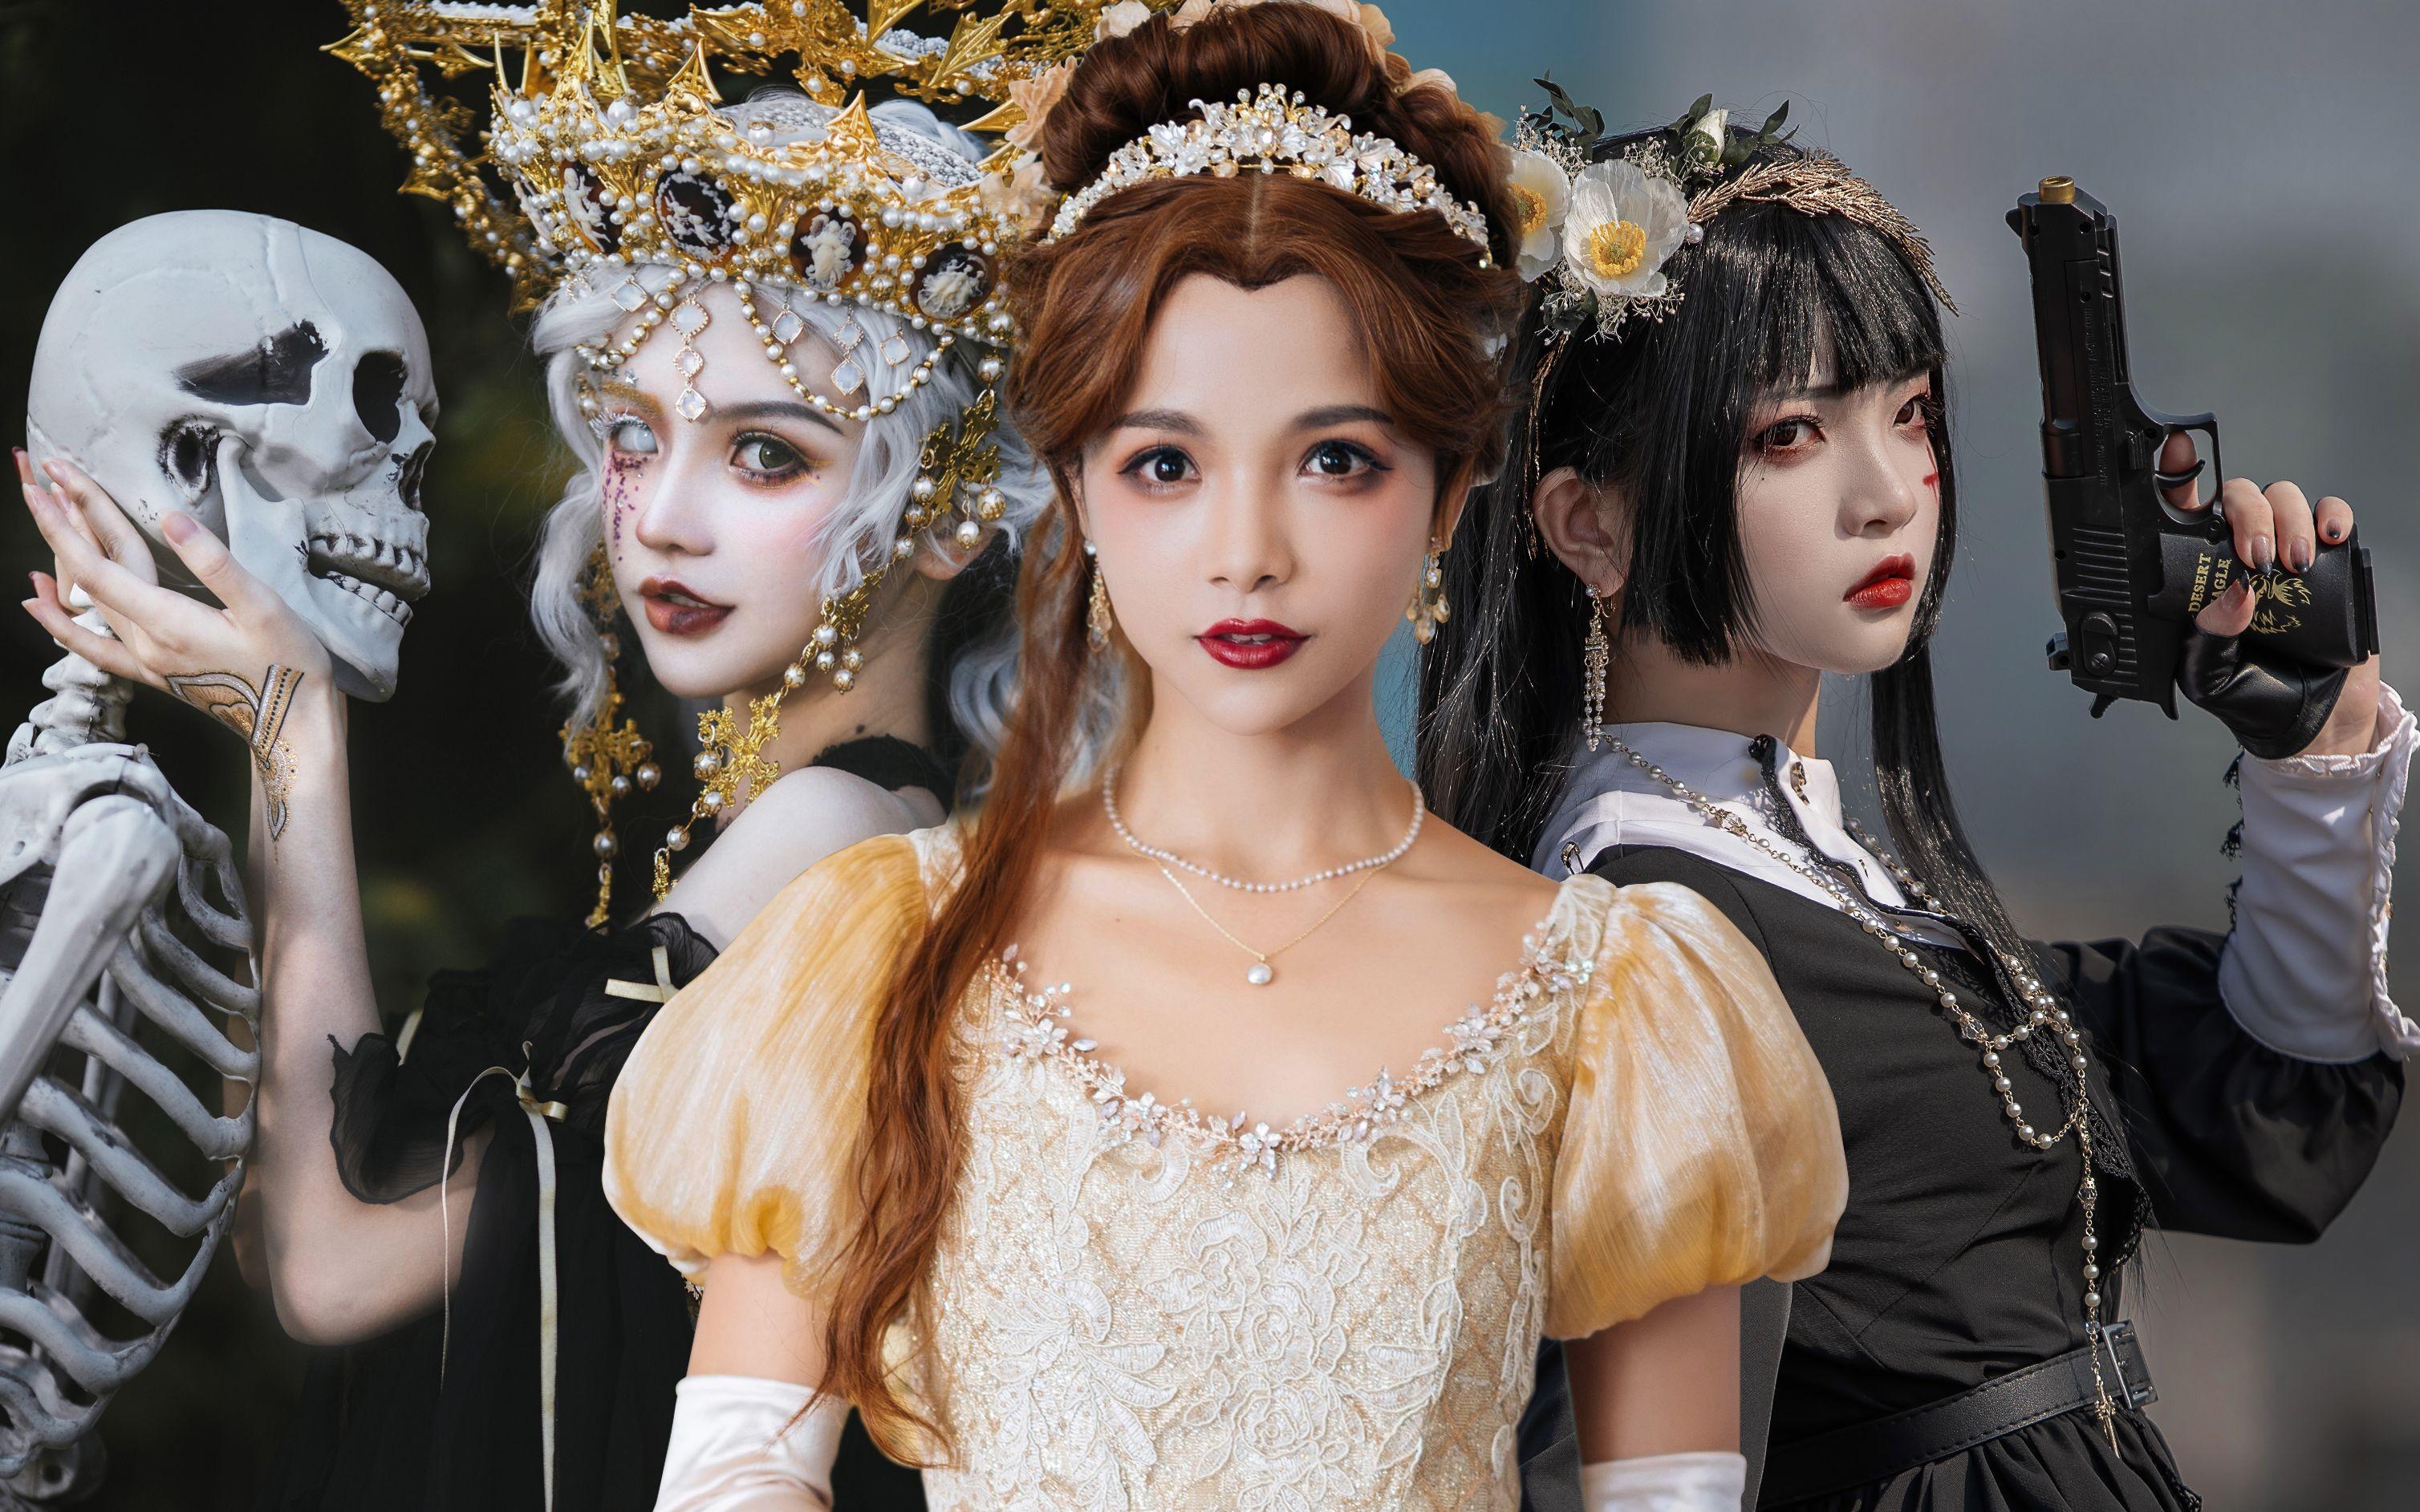 【Lolita】lo娘的优雅和暗黑是什么样子的?(一见倾心系列)